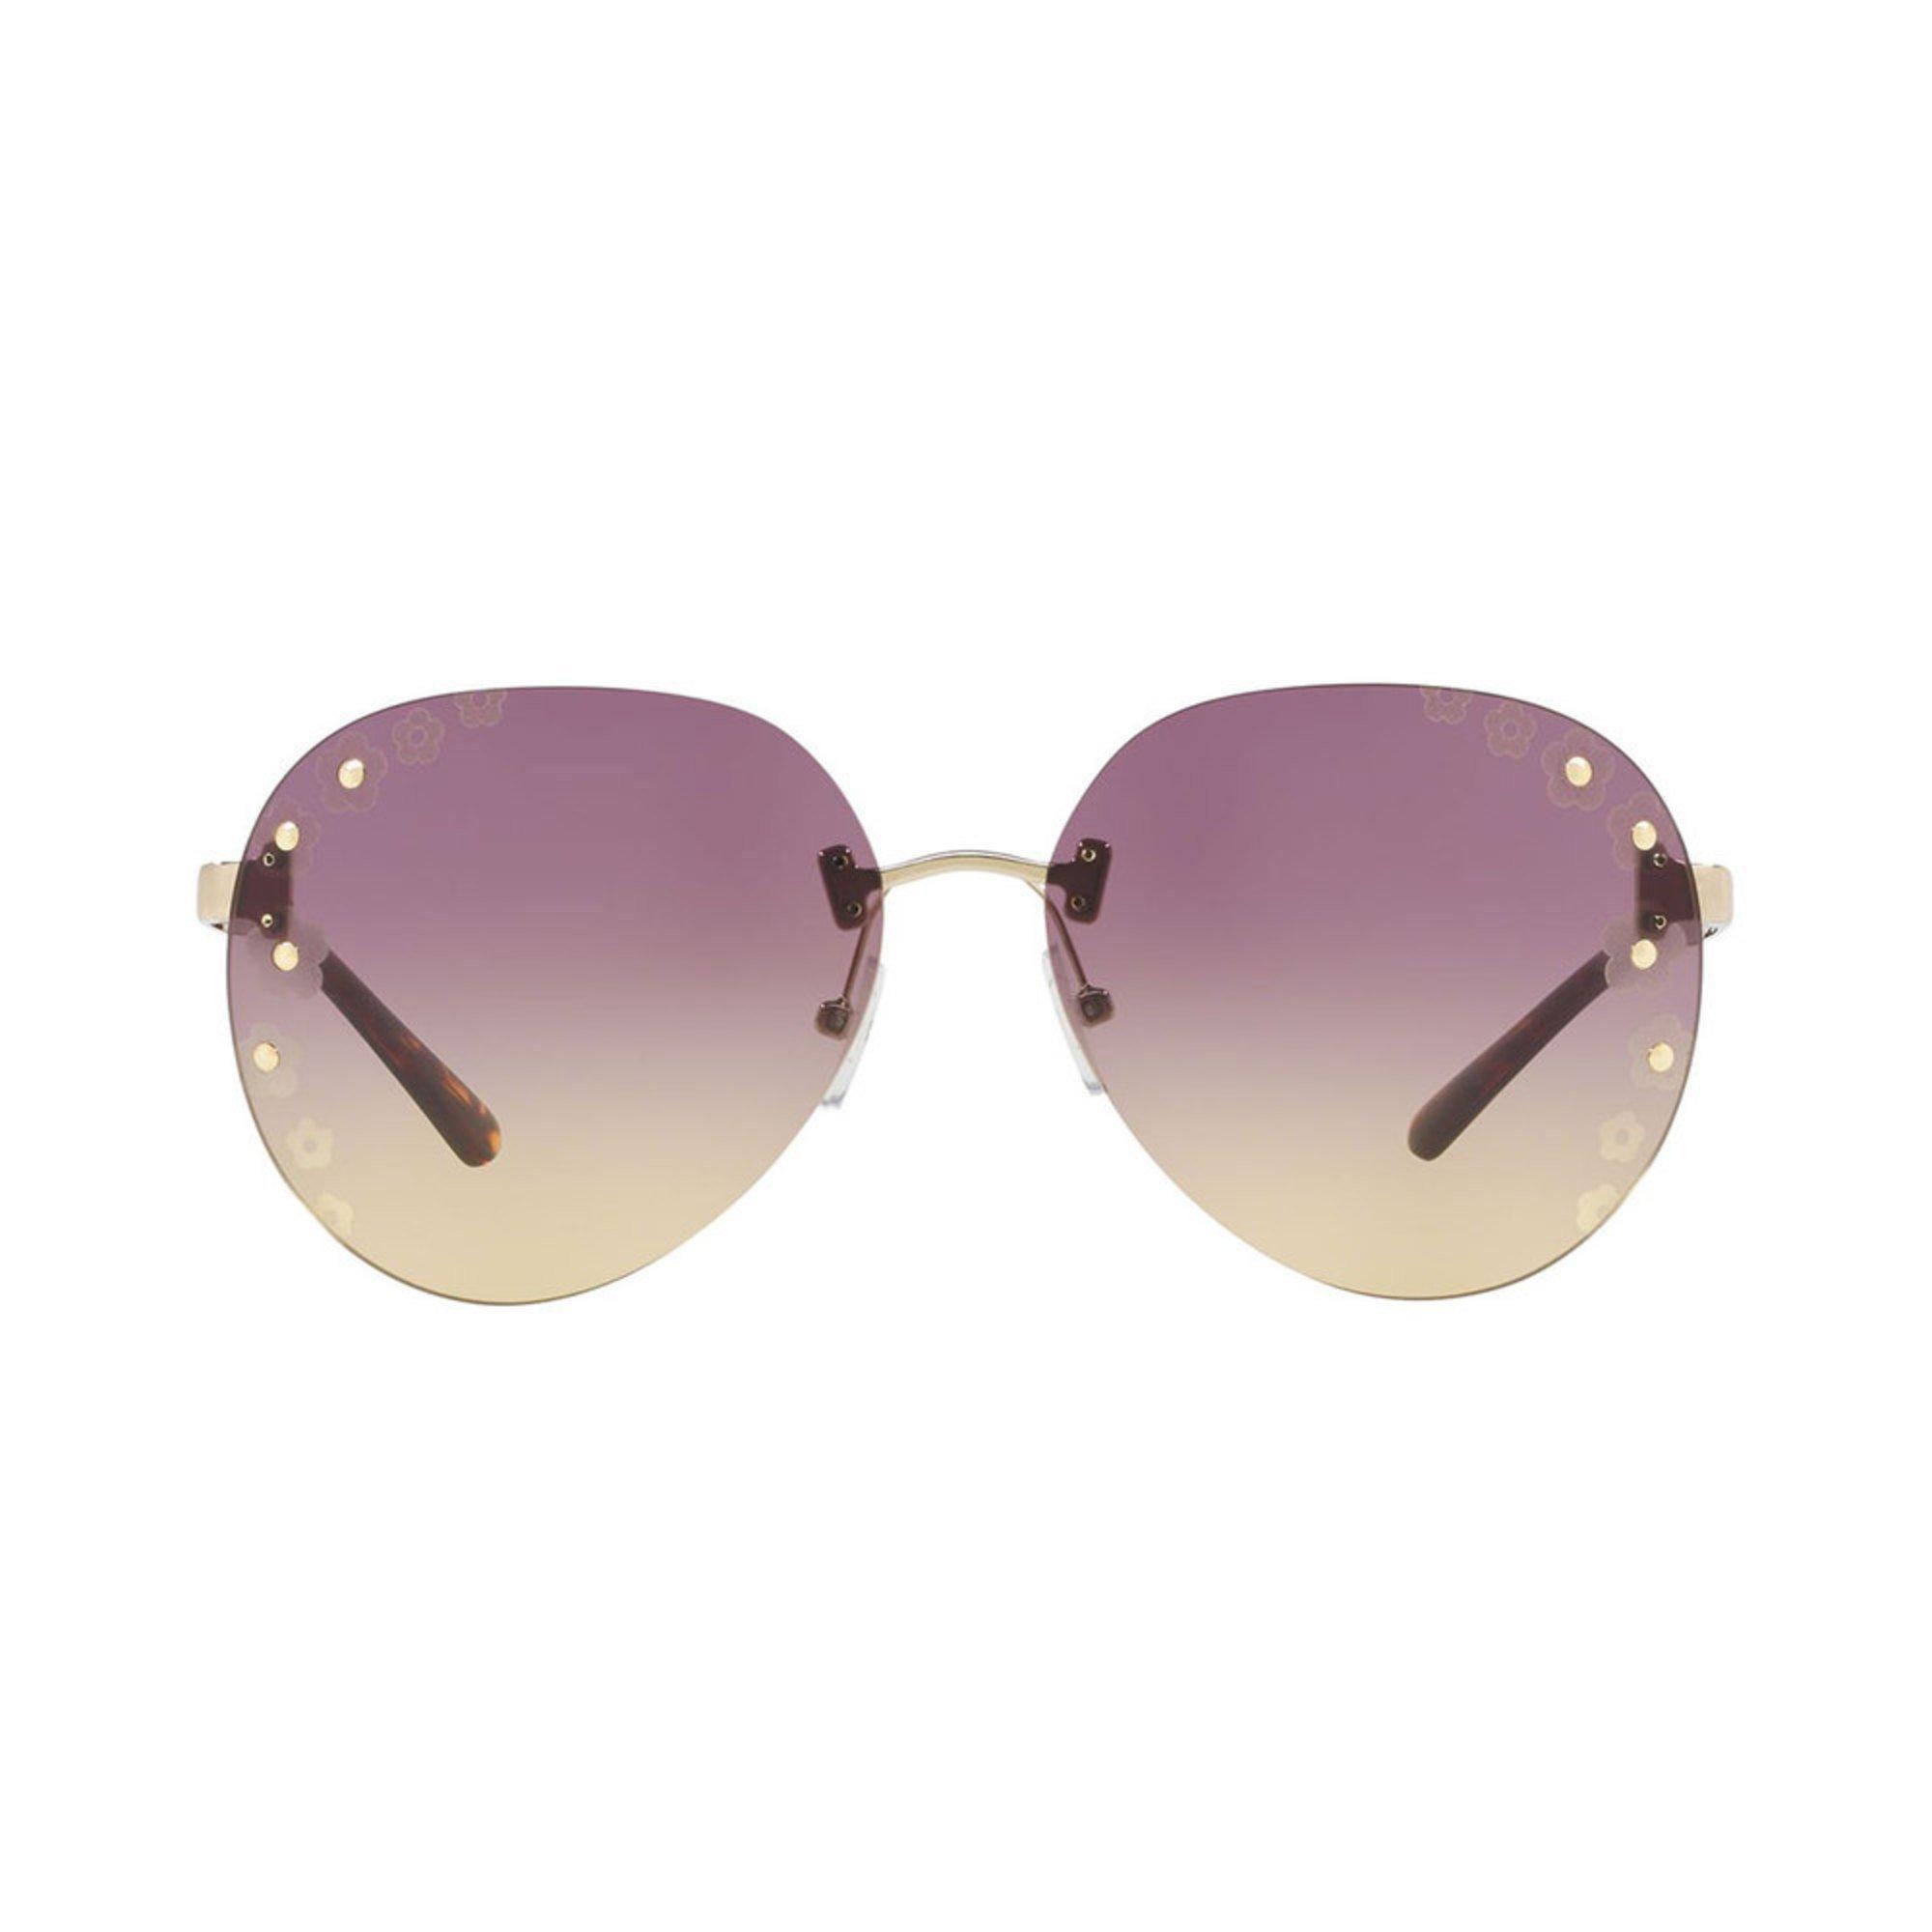 8270bbc8ab70 Michael Kors Women's Sydney Sunglasses | Search Results ...